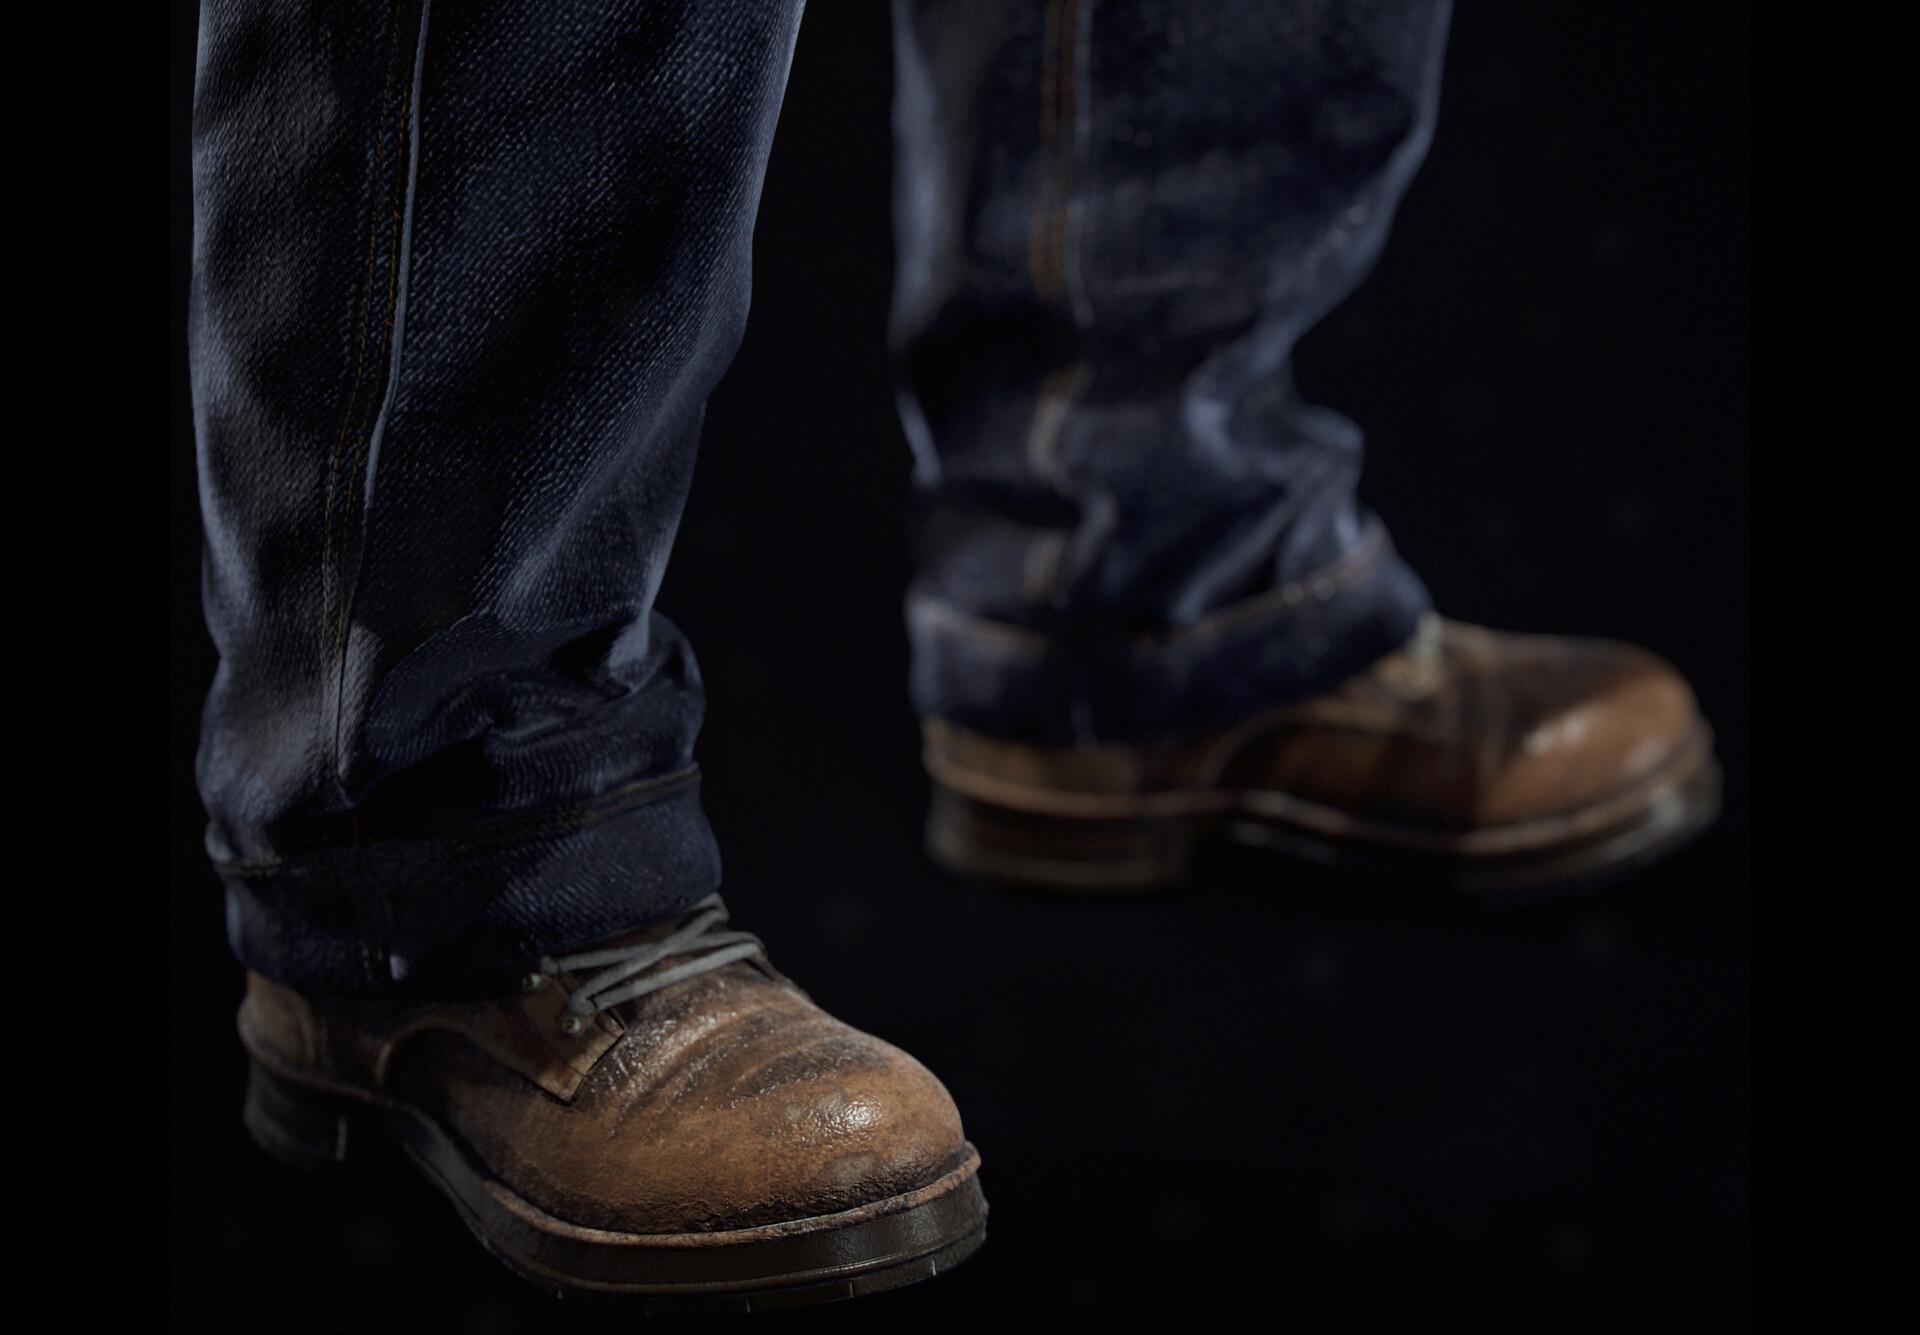 Antone magdy shoe